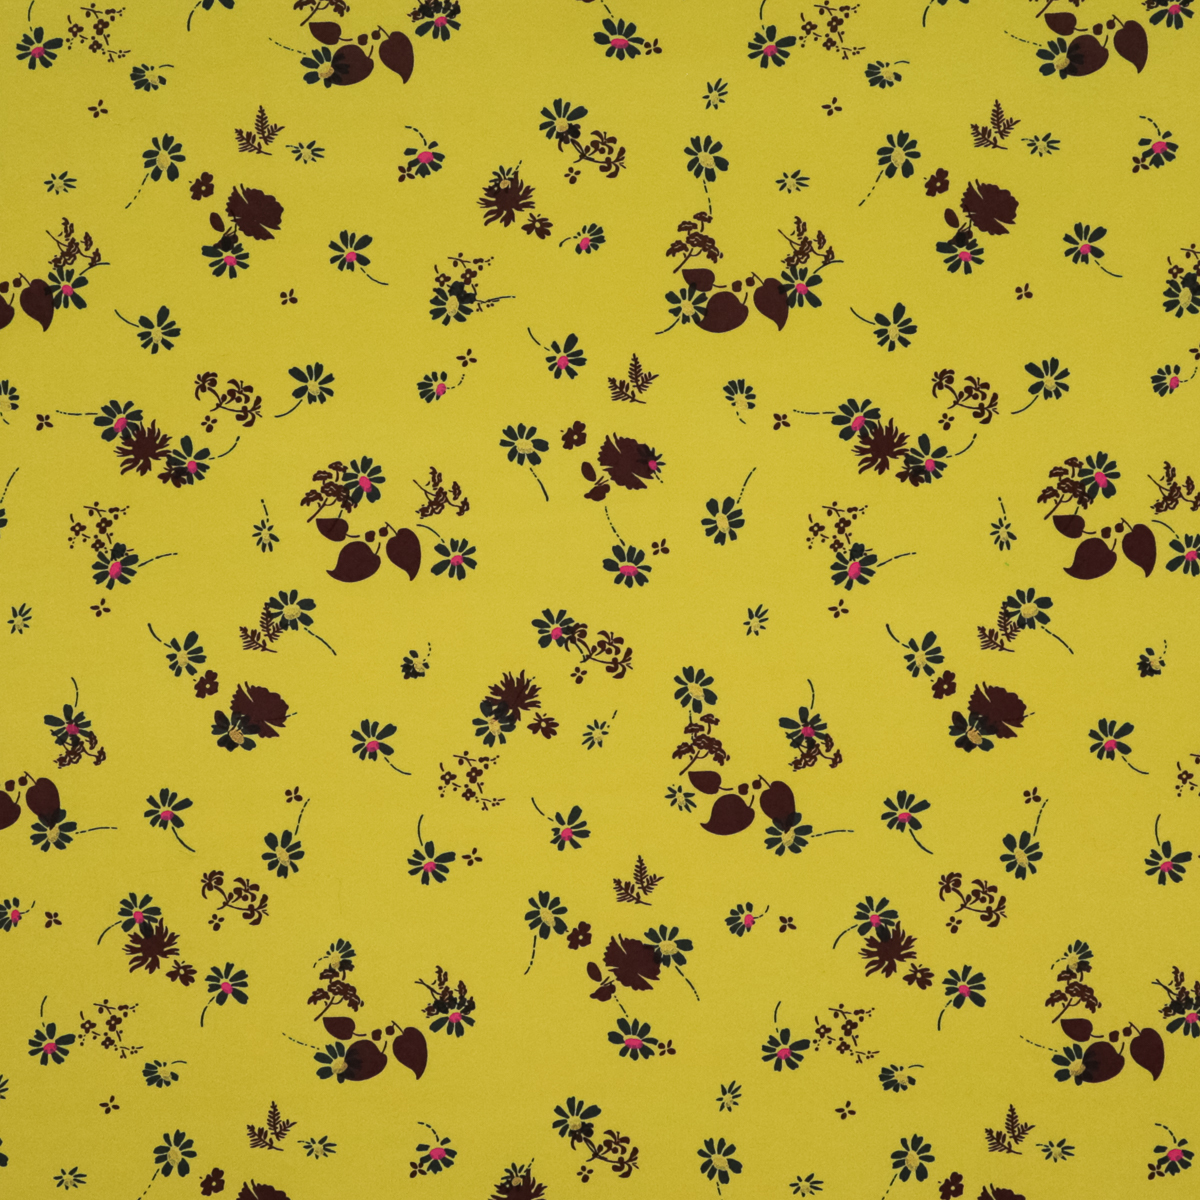 Плотная пальтовая ткань с цветами